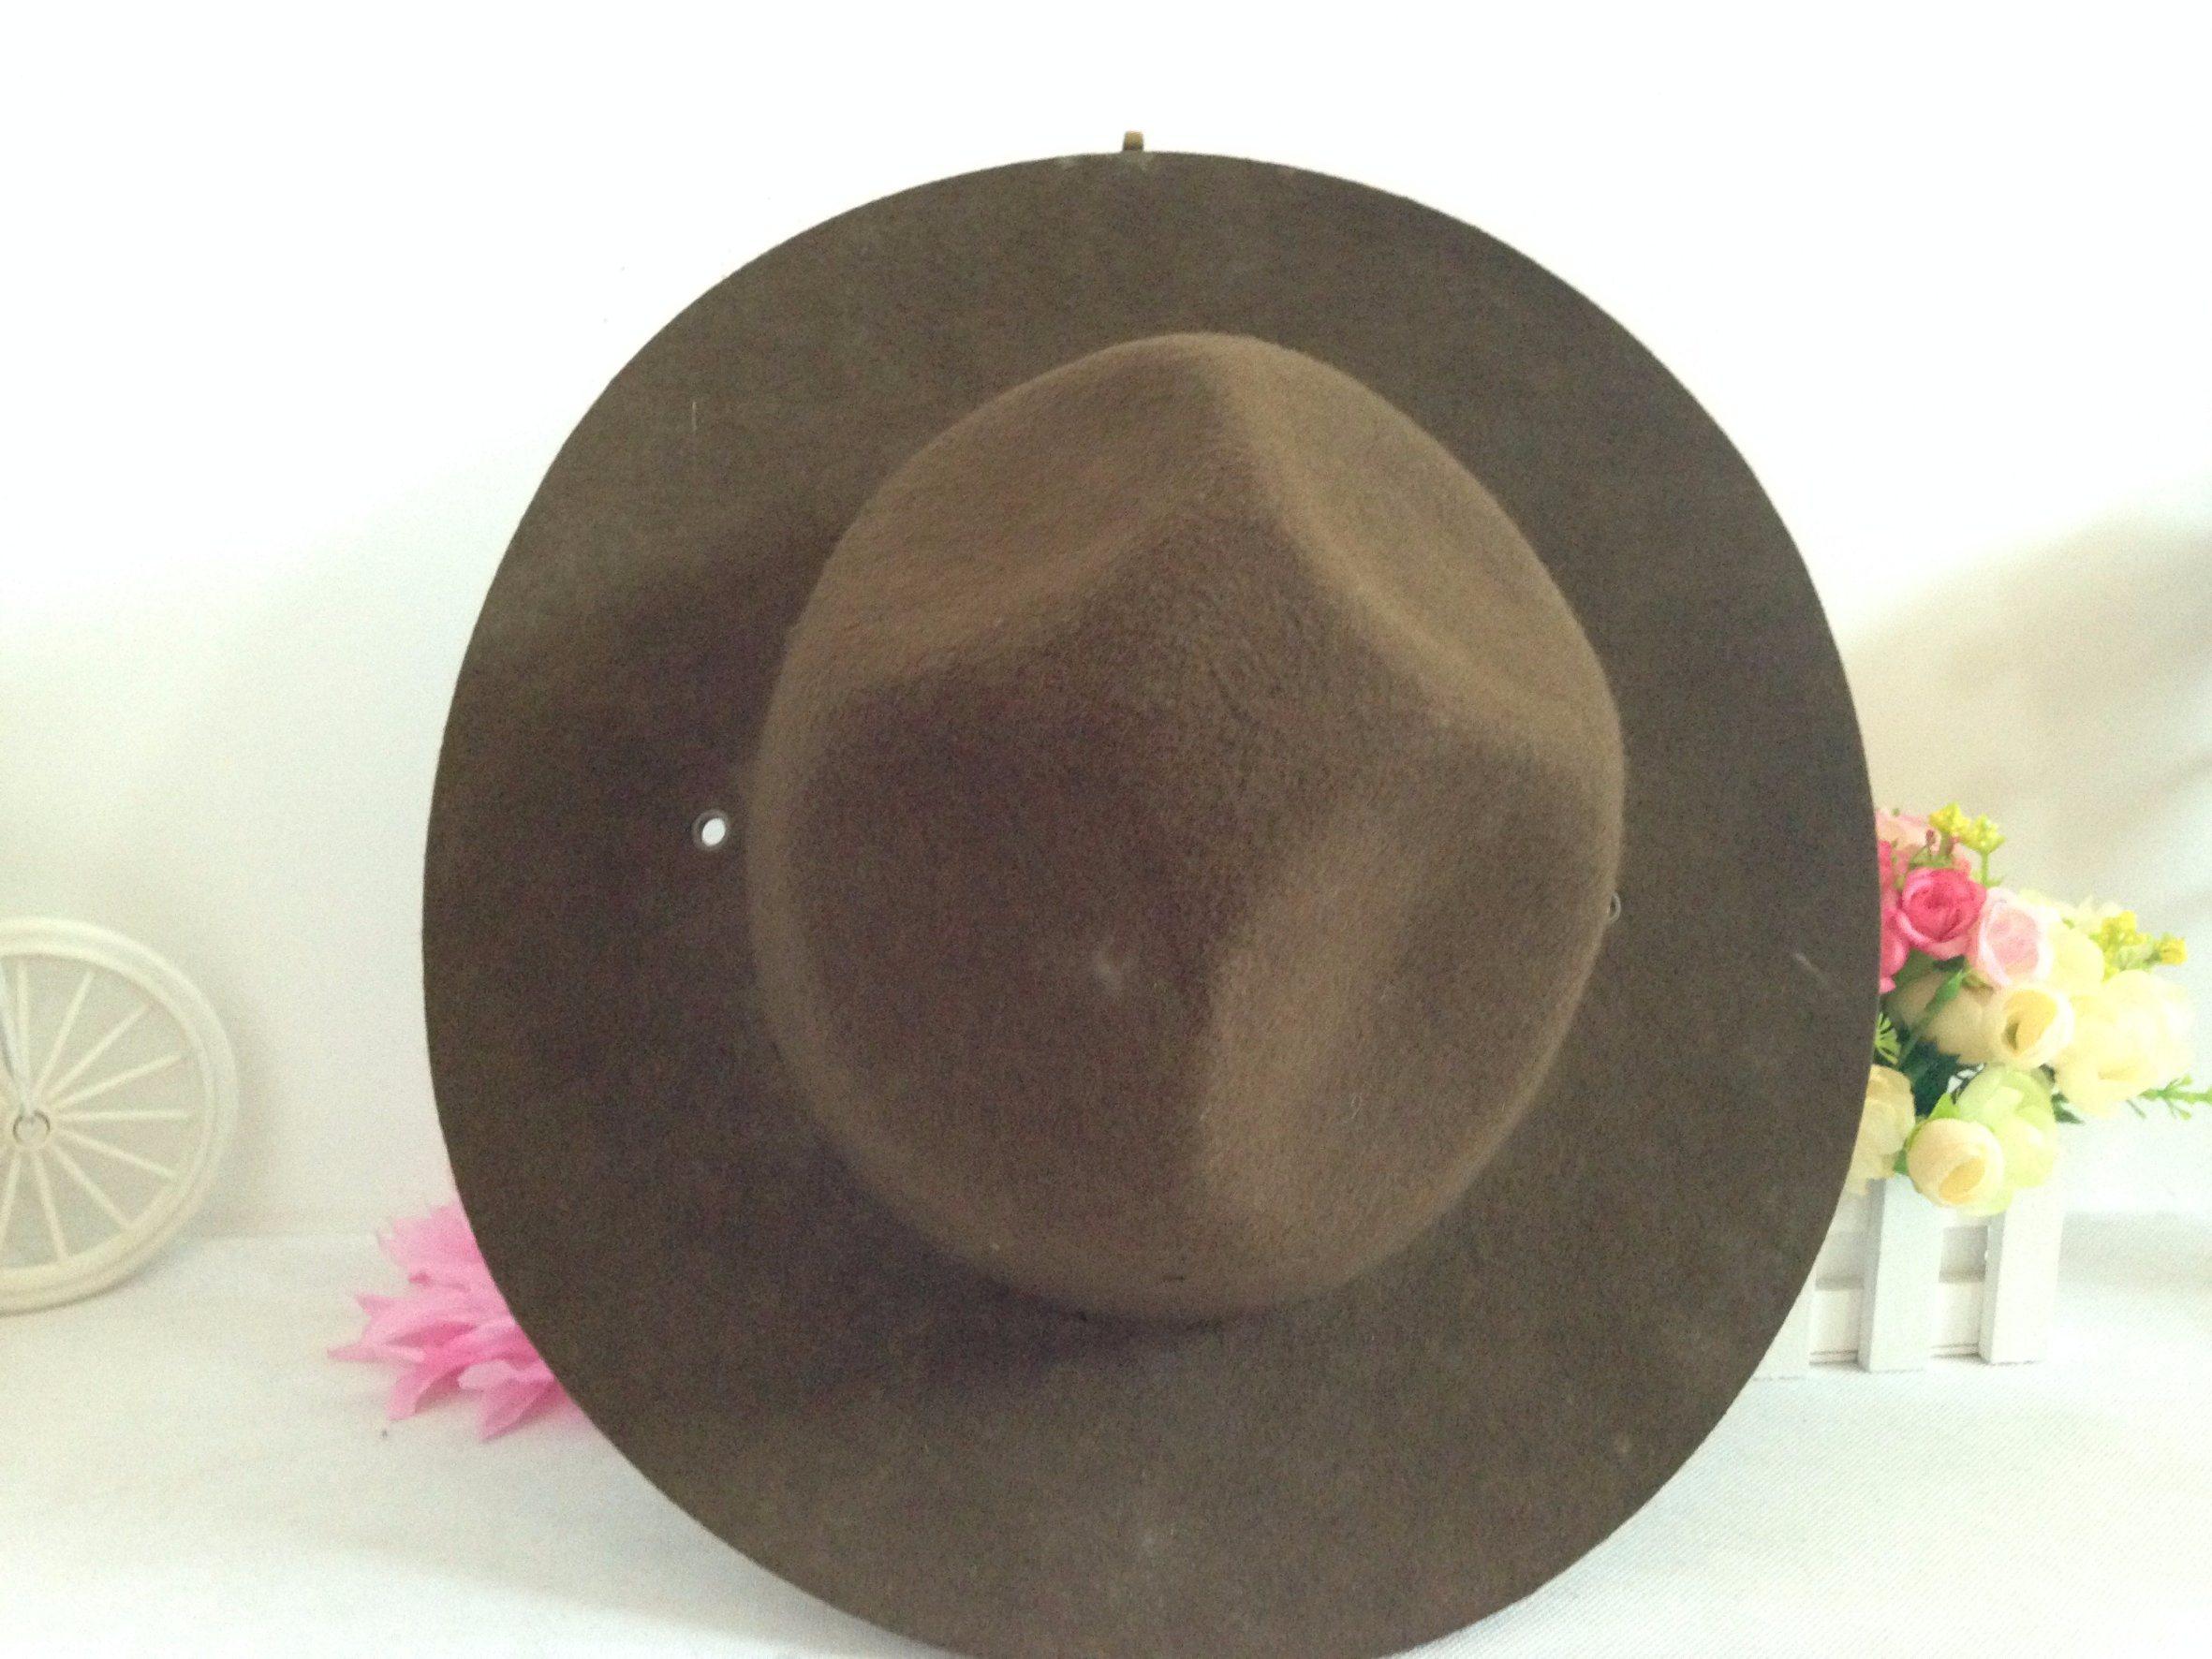 100% Wool Felt Military Fedora Hat in Hotsale